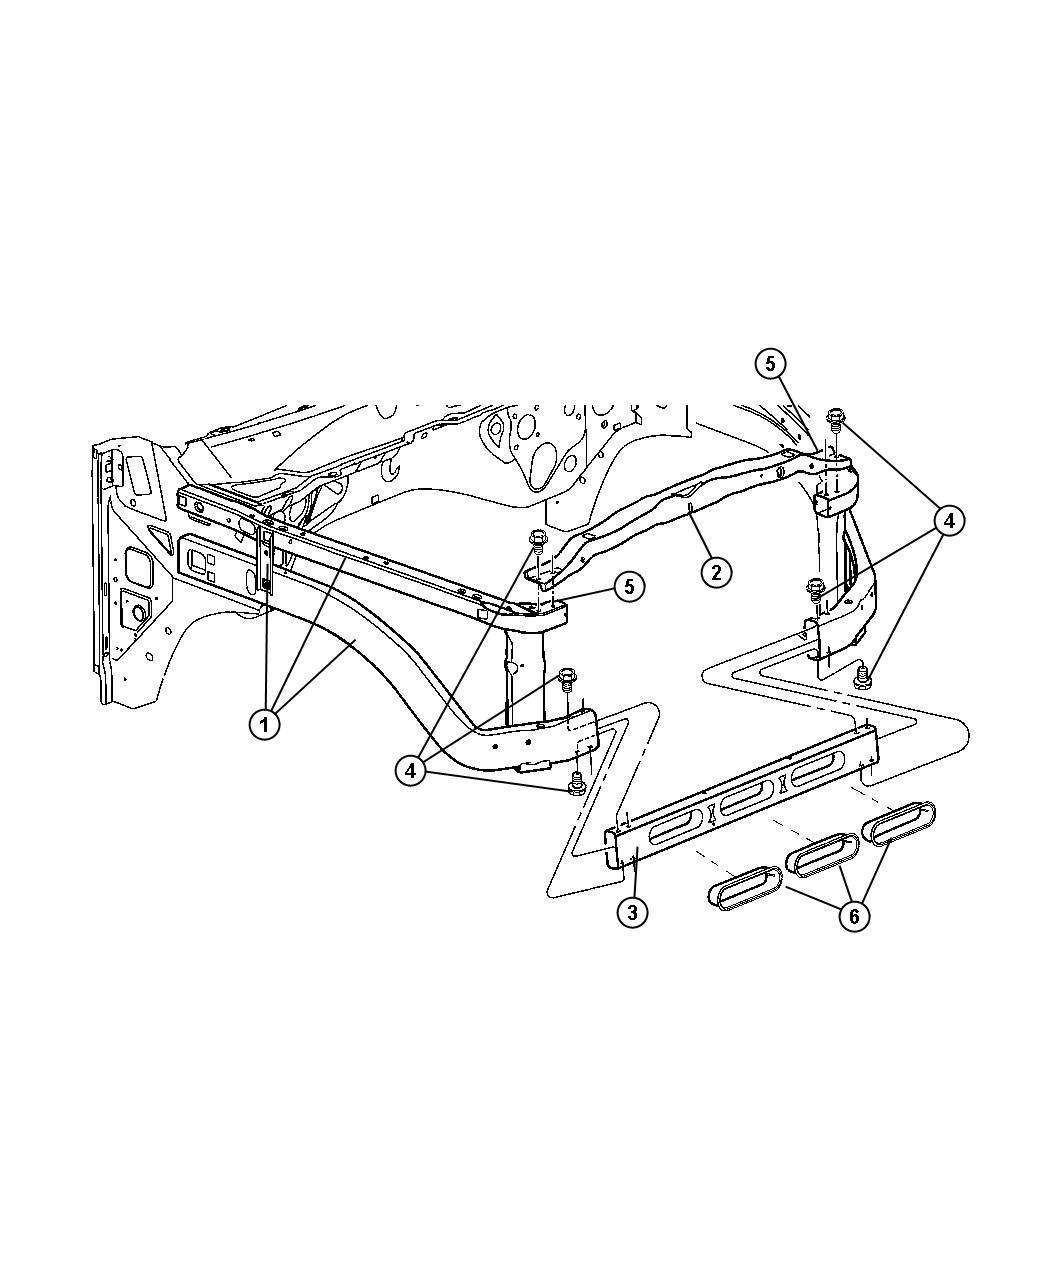 2011 Jeep Compass Closure, panel. Radiator, radiator